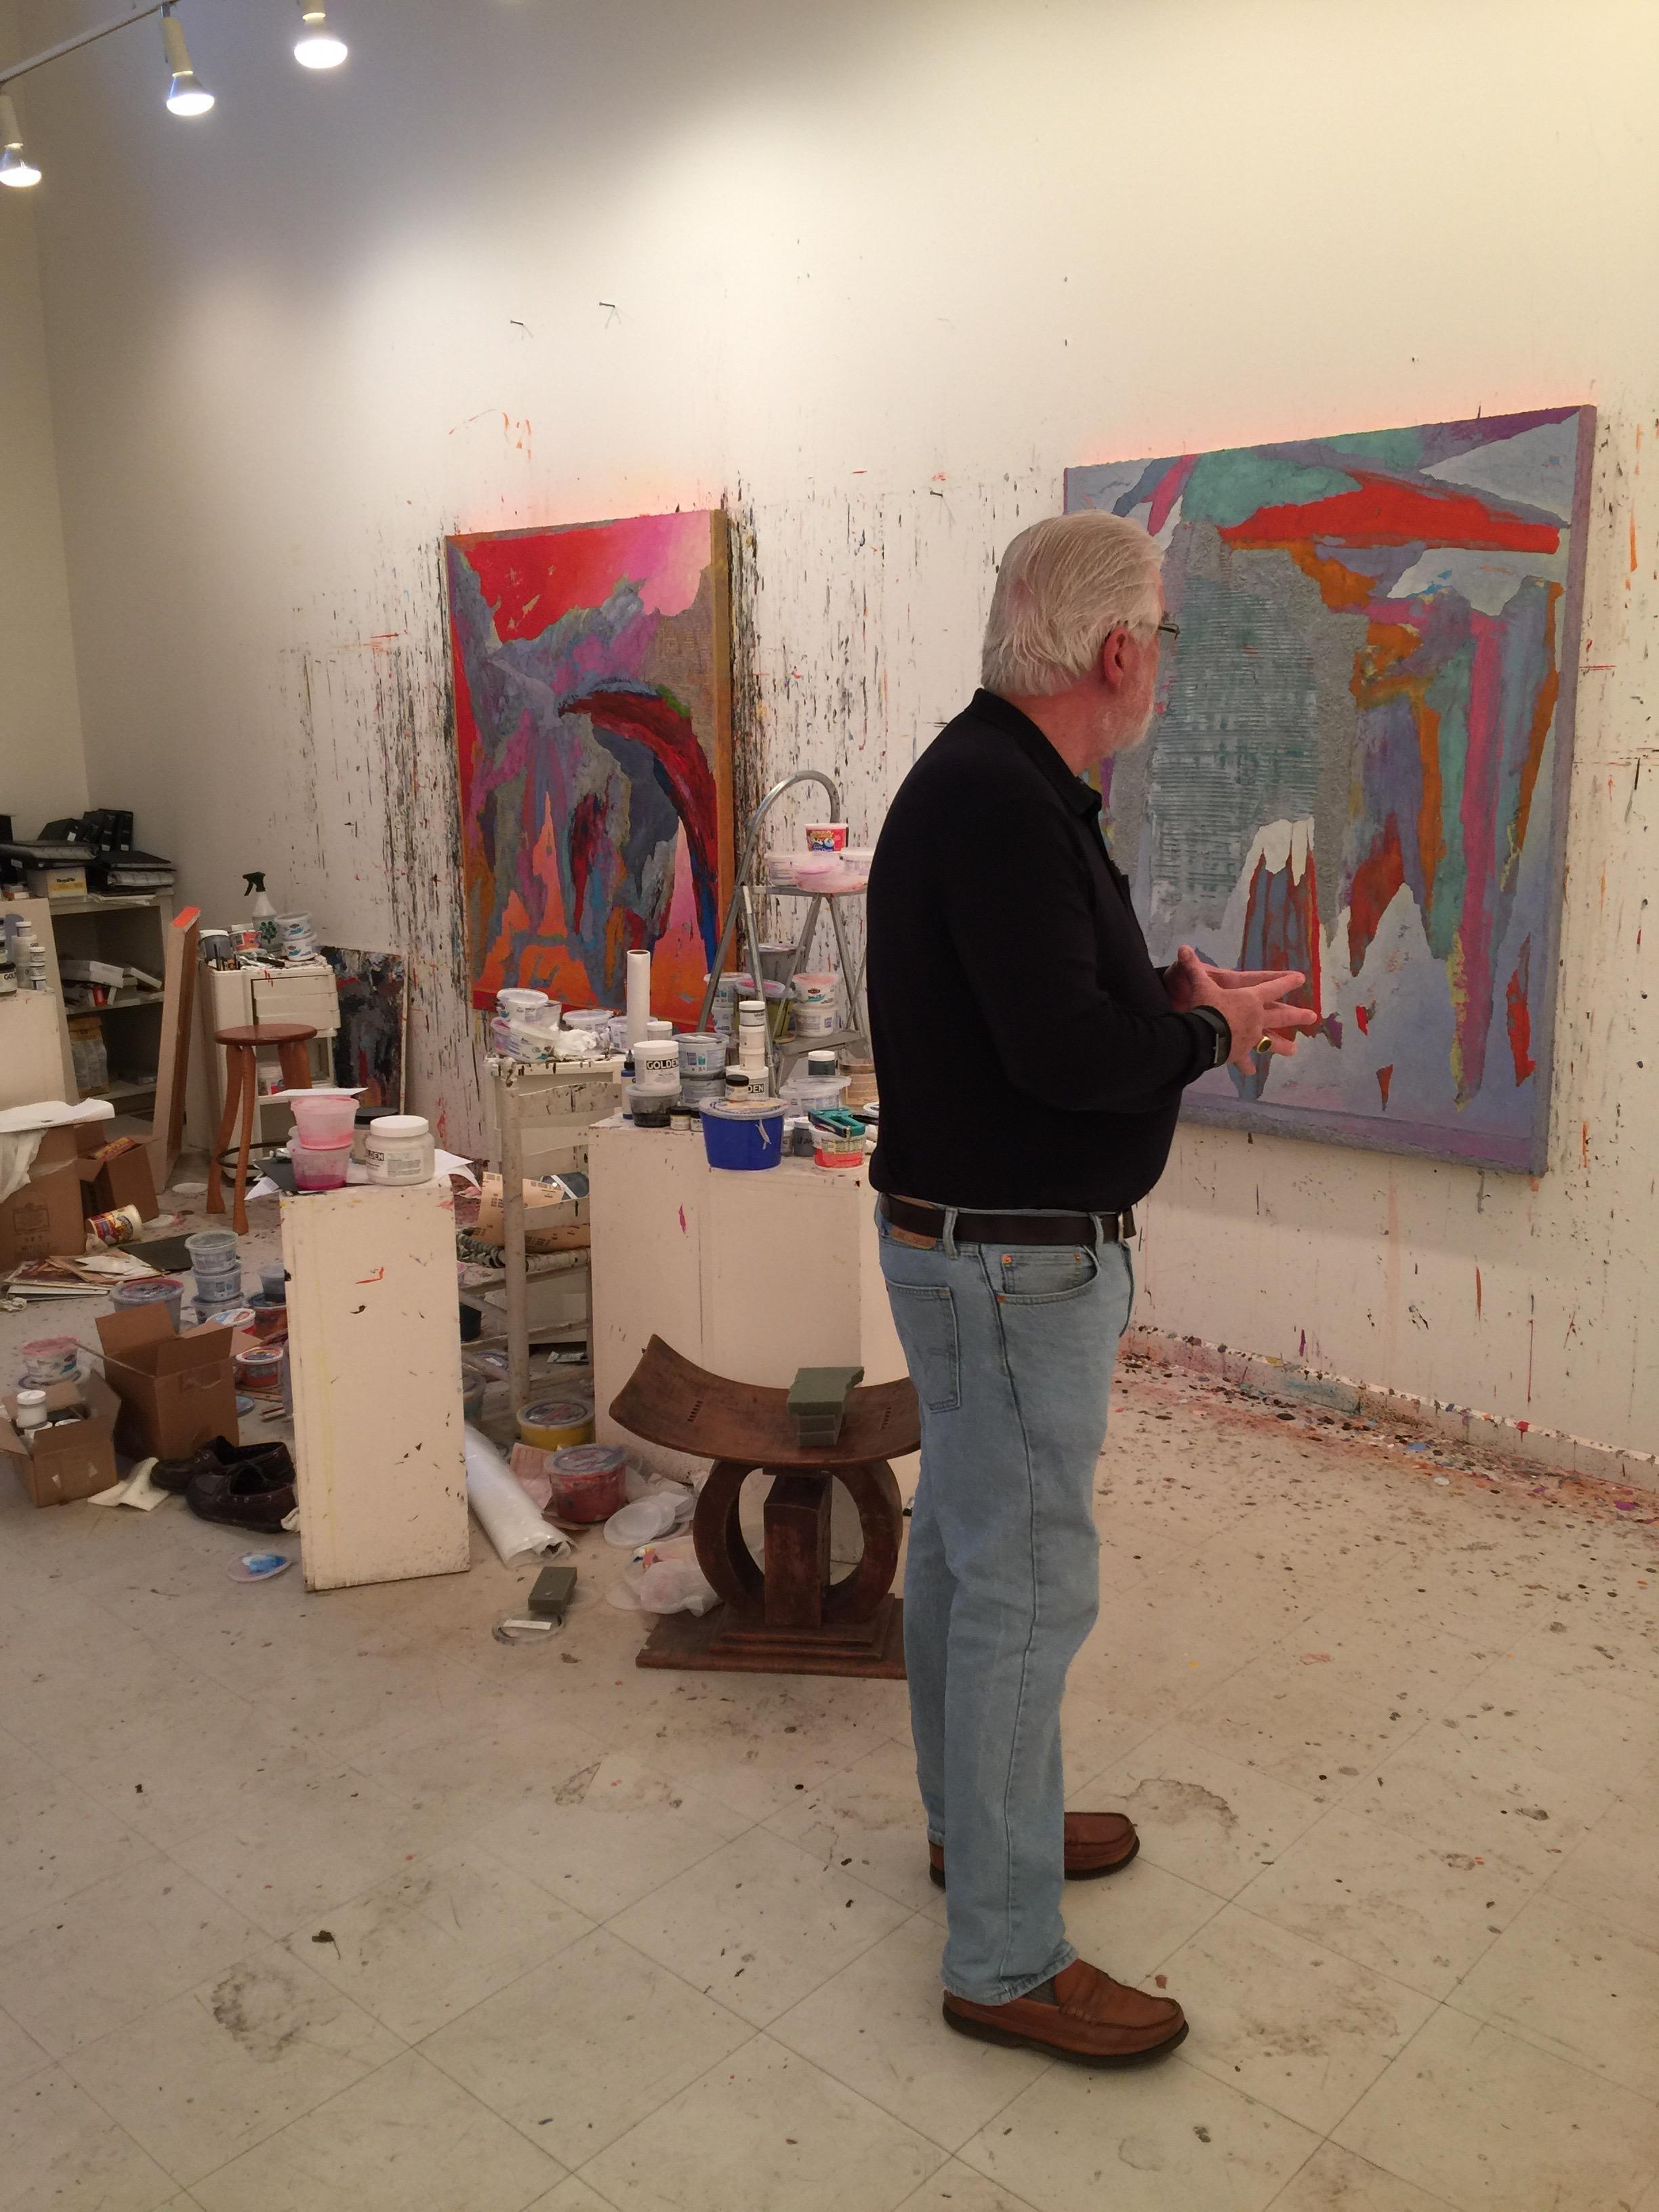 herb jackson in his studio in davidson, nc